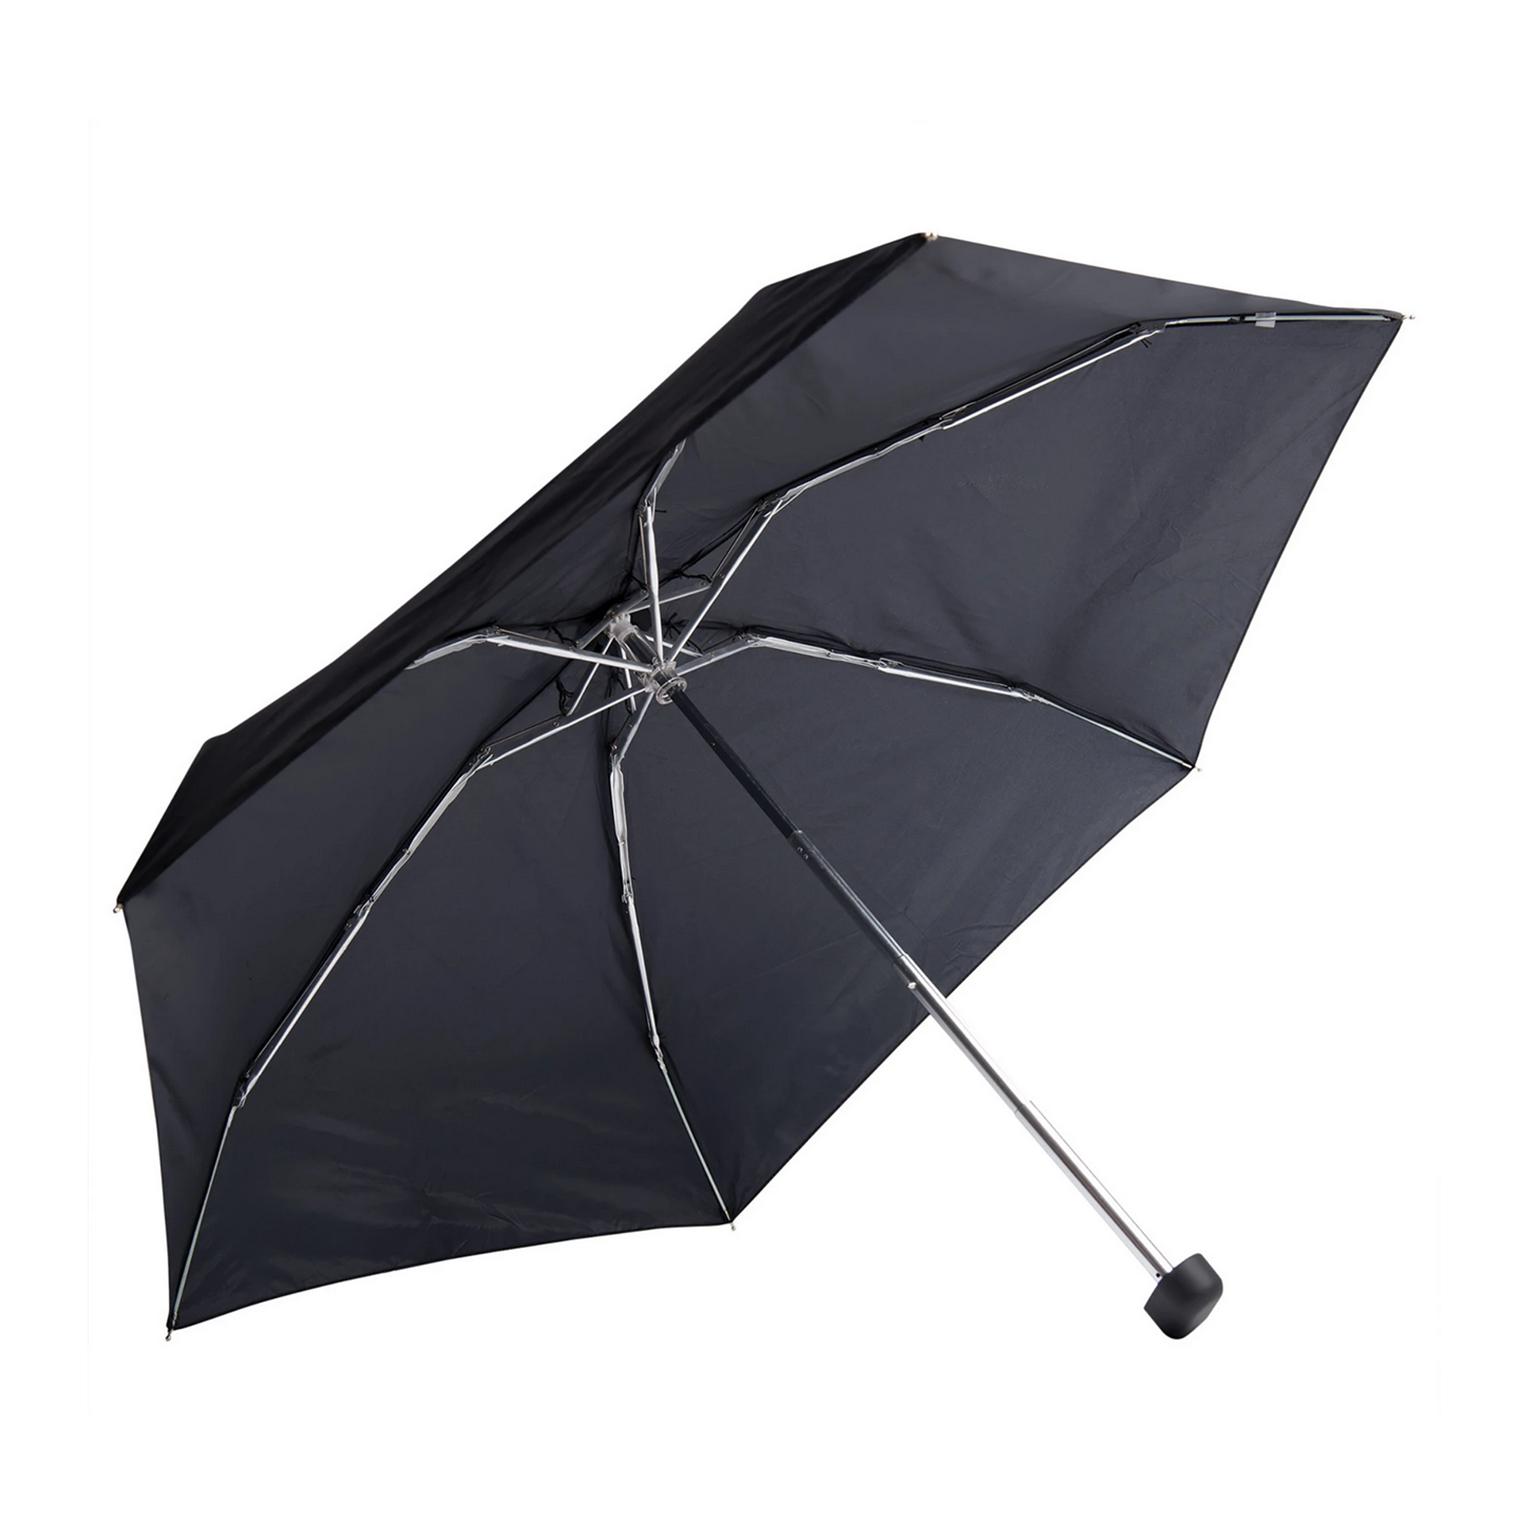 Sea to Summit Travelling Light Pocket Umbrella, Black